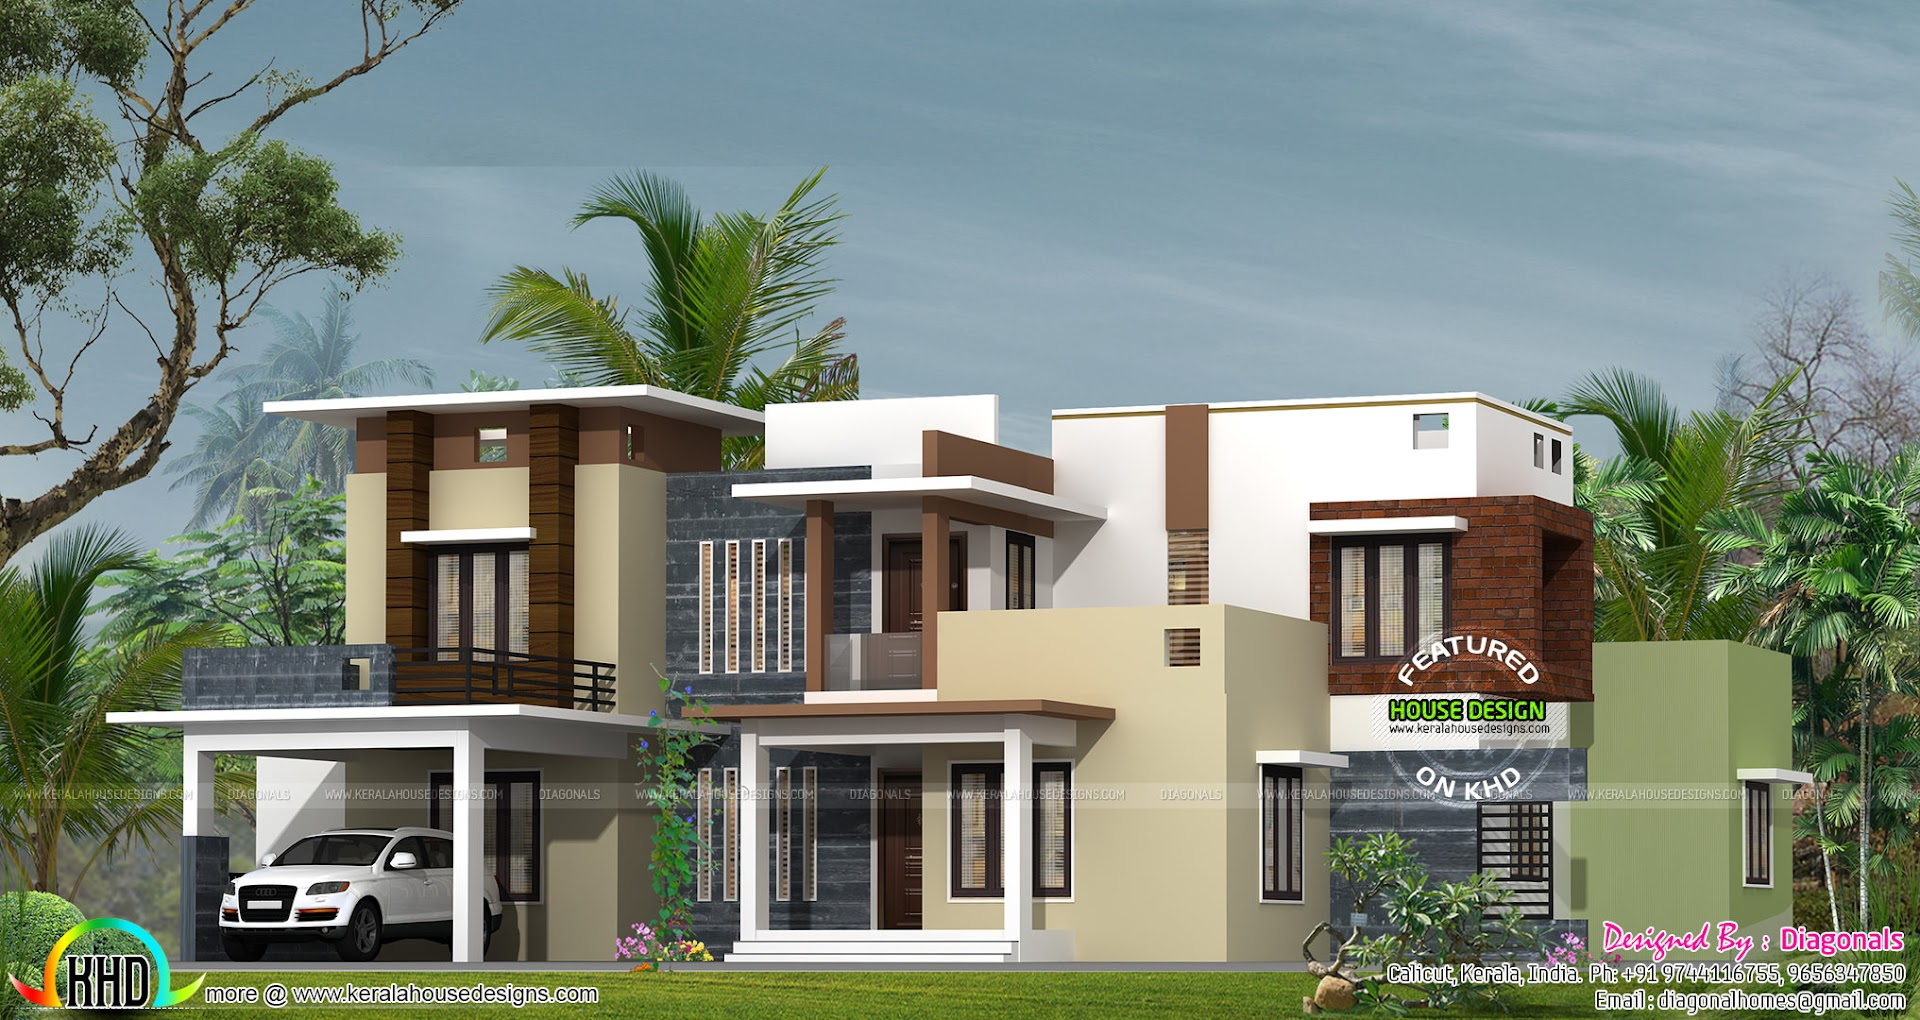 Modern box type Kerala home design - Kerala home design ...